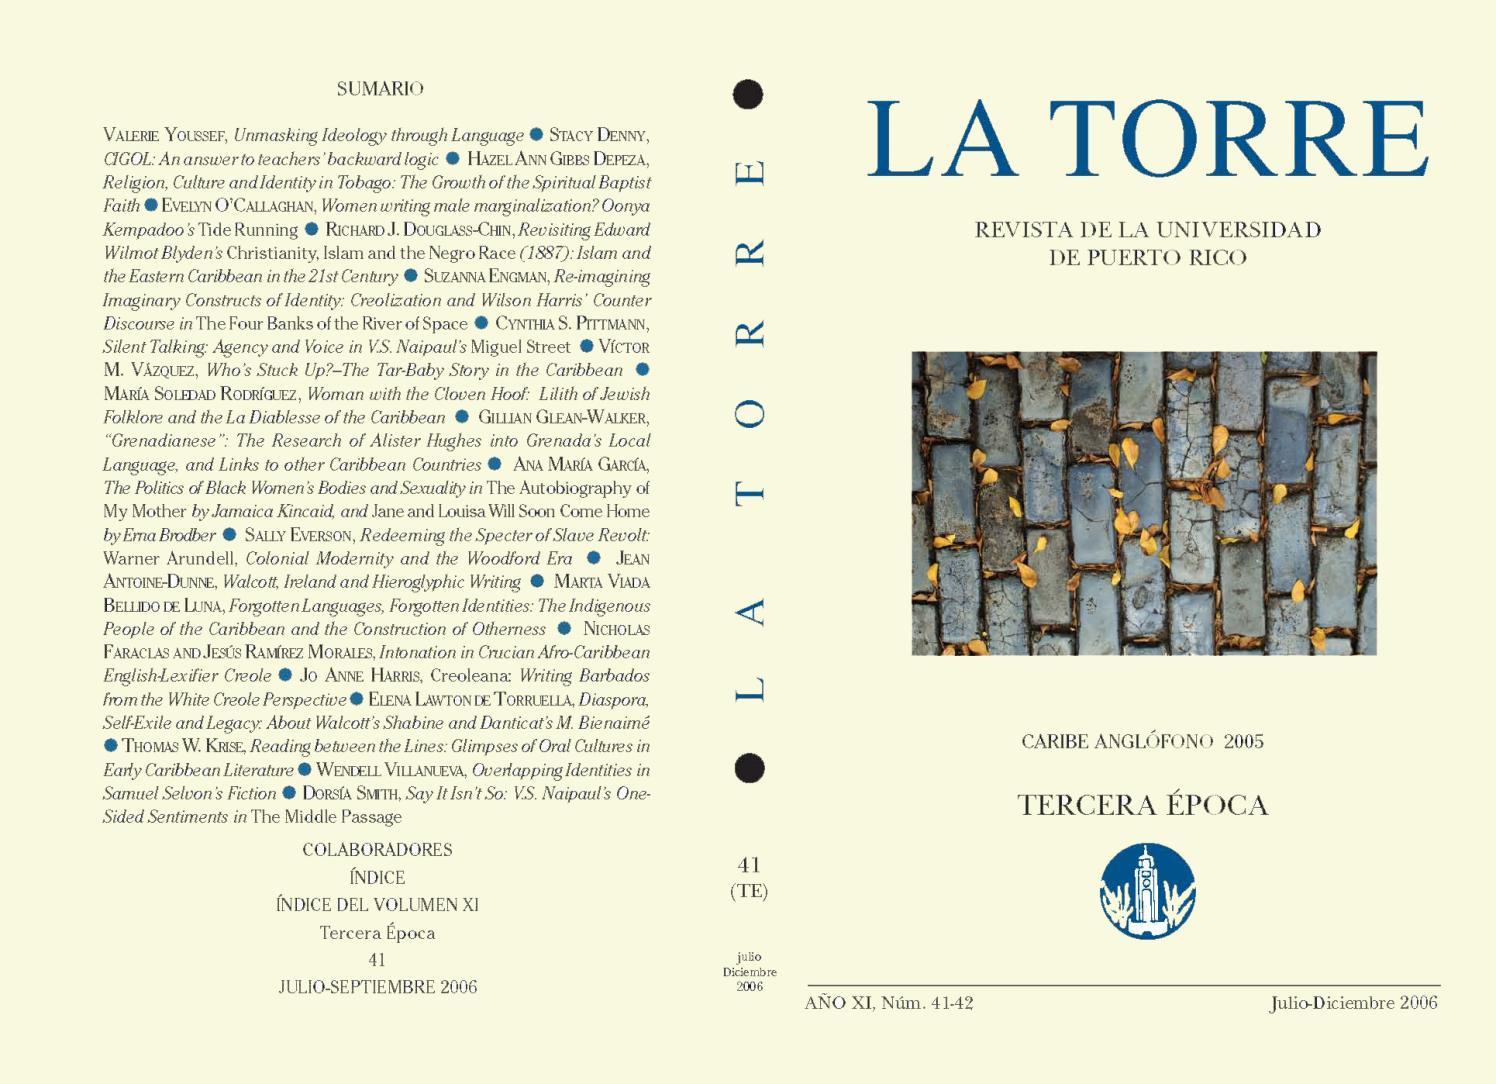 La Torre 2006 julio-diciembre (Caribe Anglófono 2005) by La ...